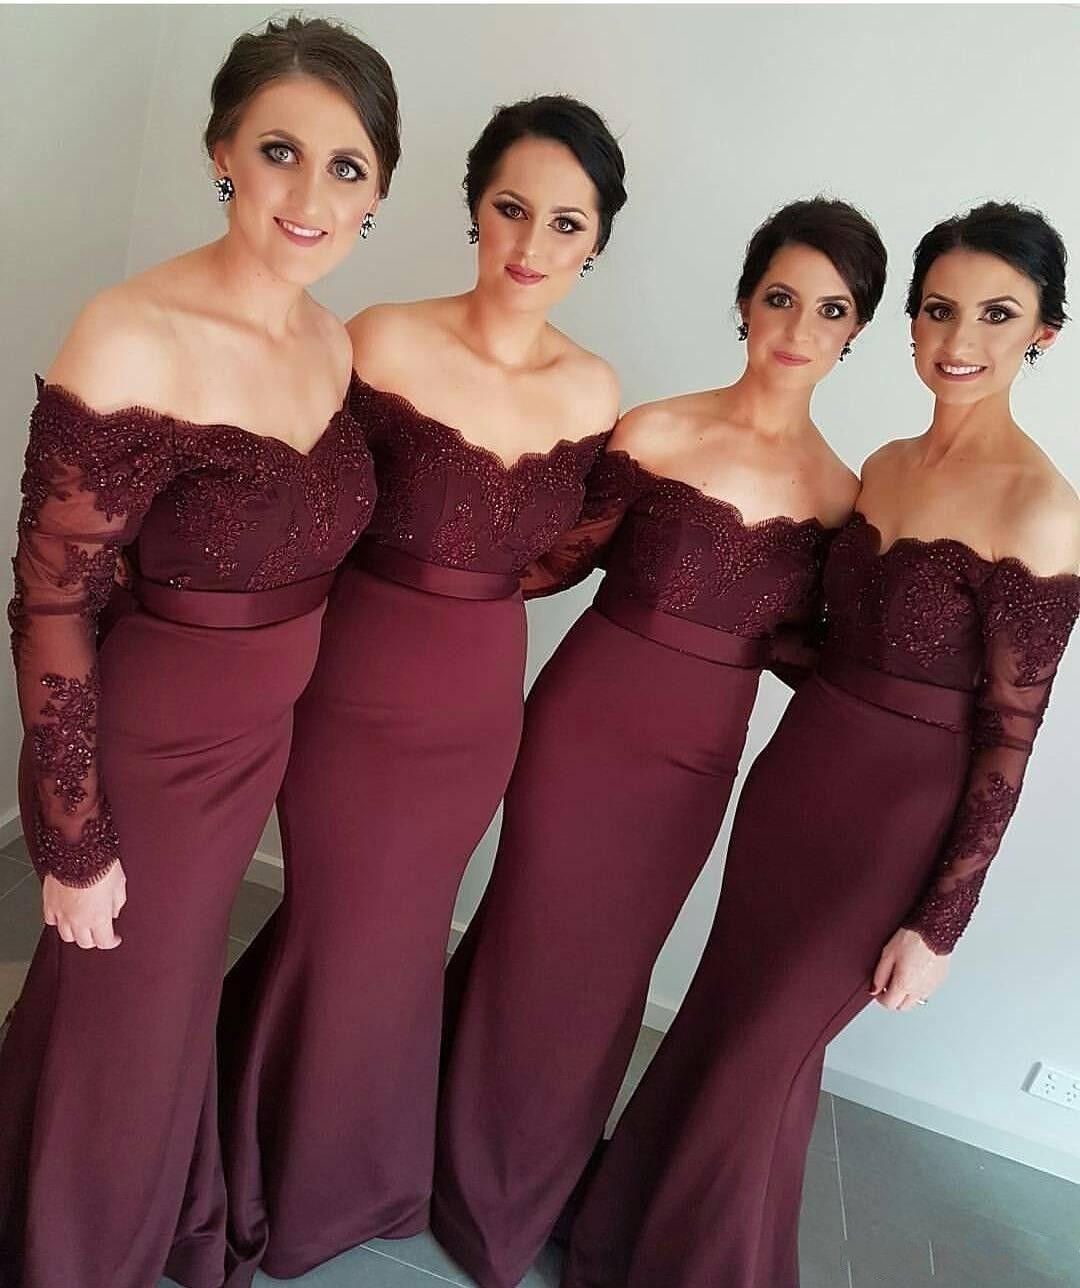 2017 Burgundy and Maroon Off Shoulder Mermaid Bridesmaid Dresses Long Sleeve Lace Applique Cheap Custom Made Bridesmaids Wedding Dress